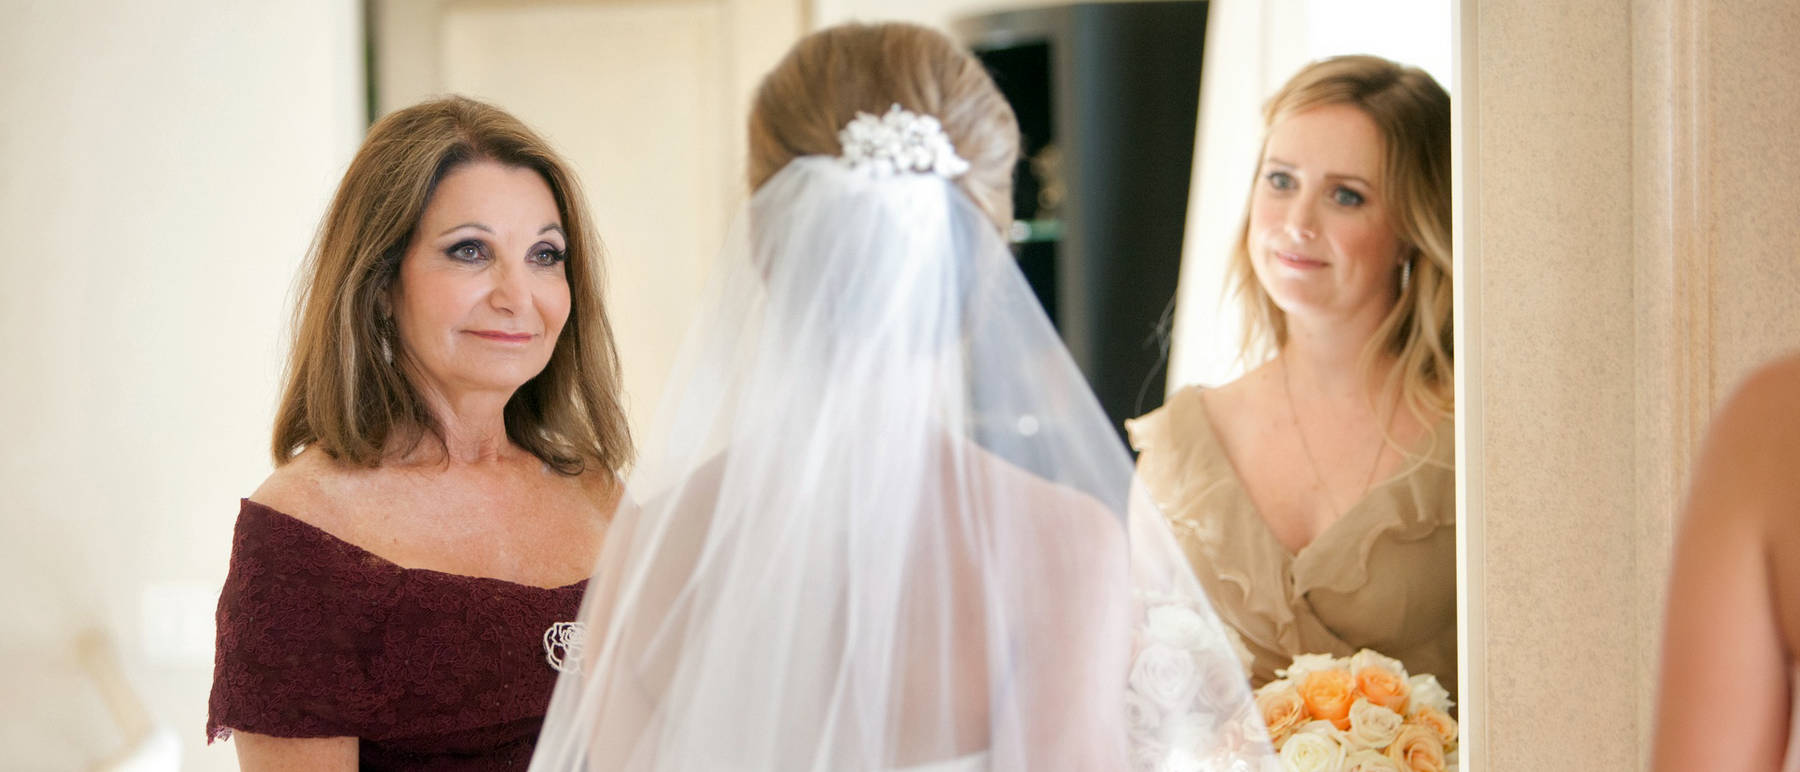 johnandjoseph-wedding-photographer-hz-slider-157